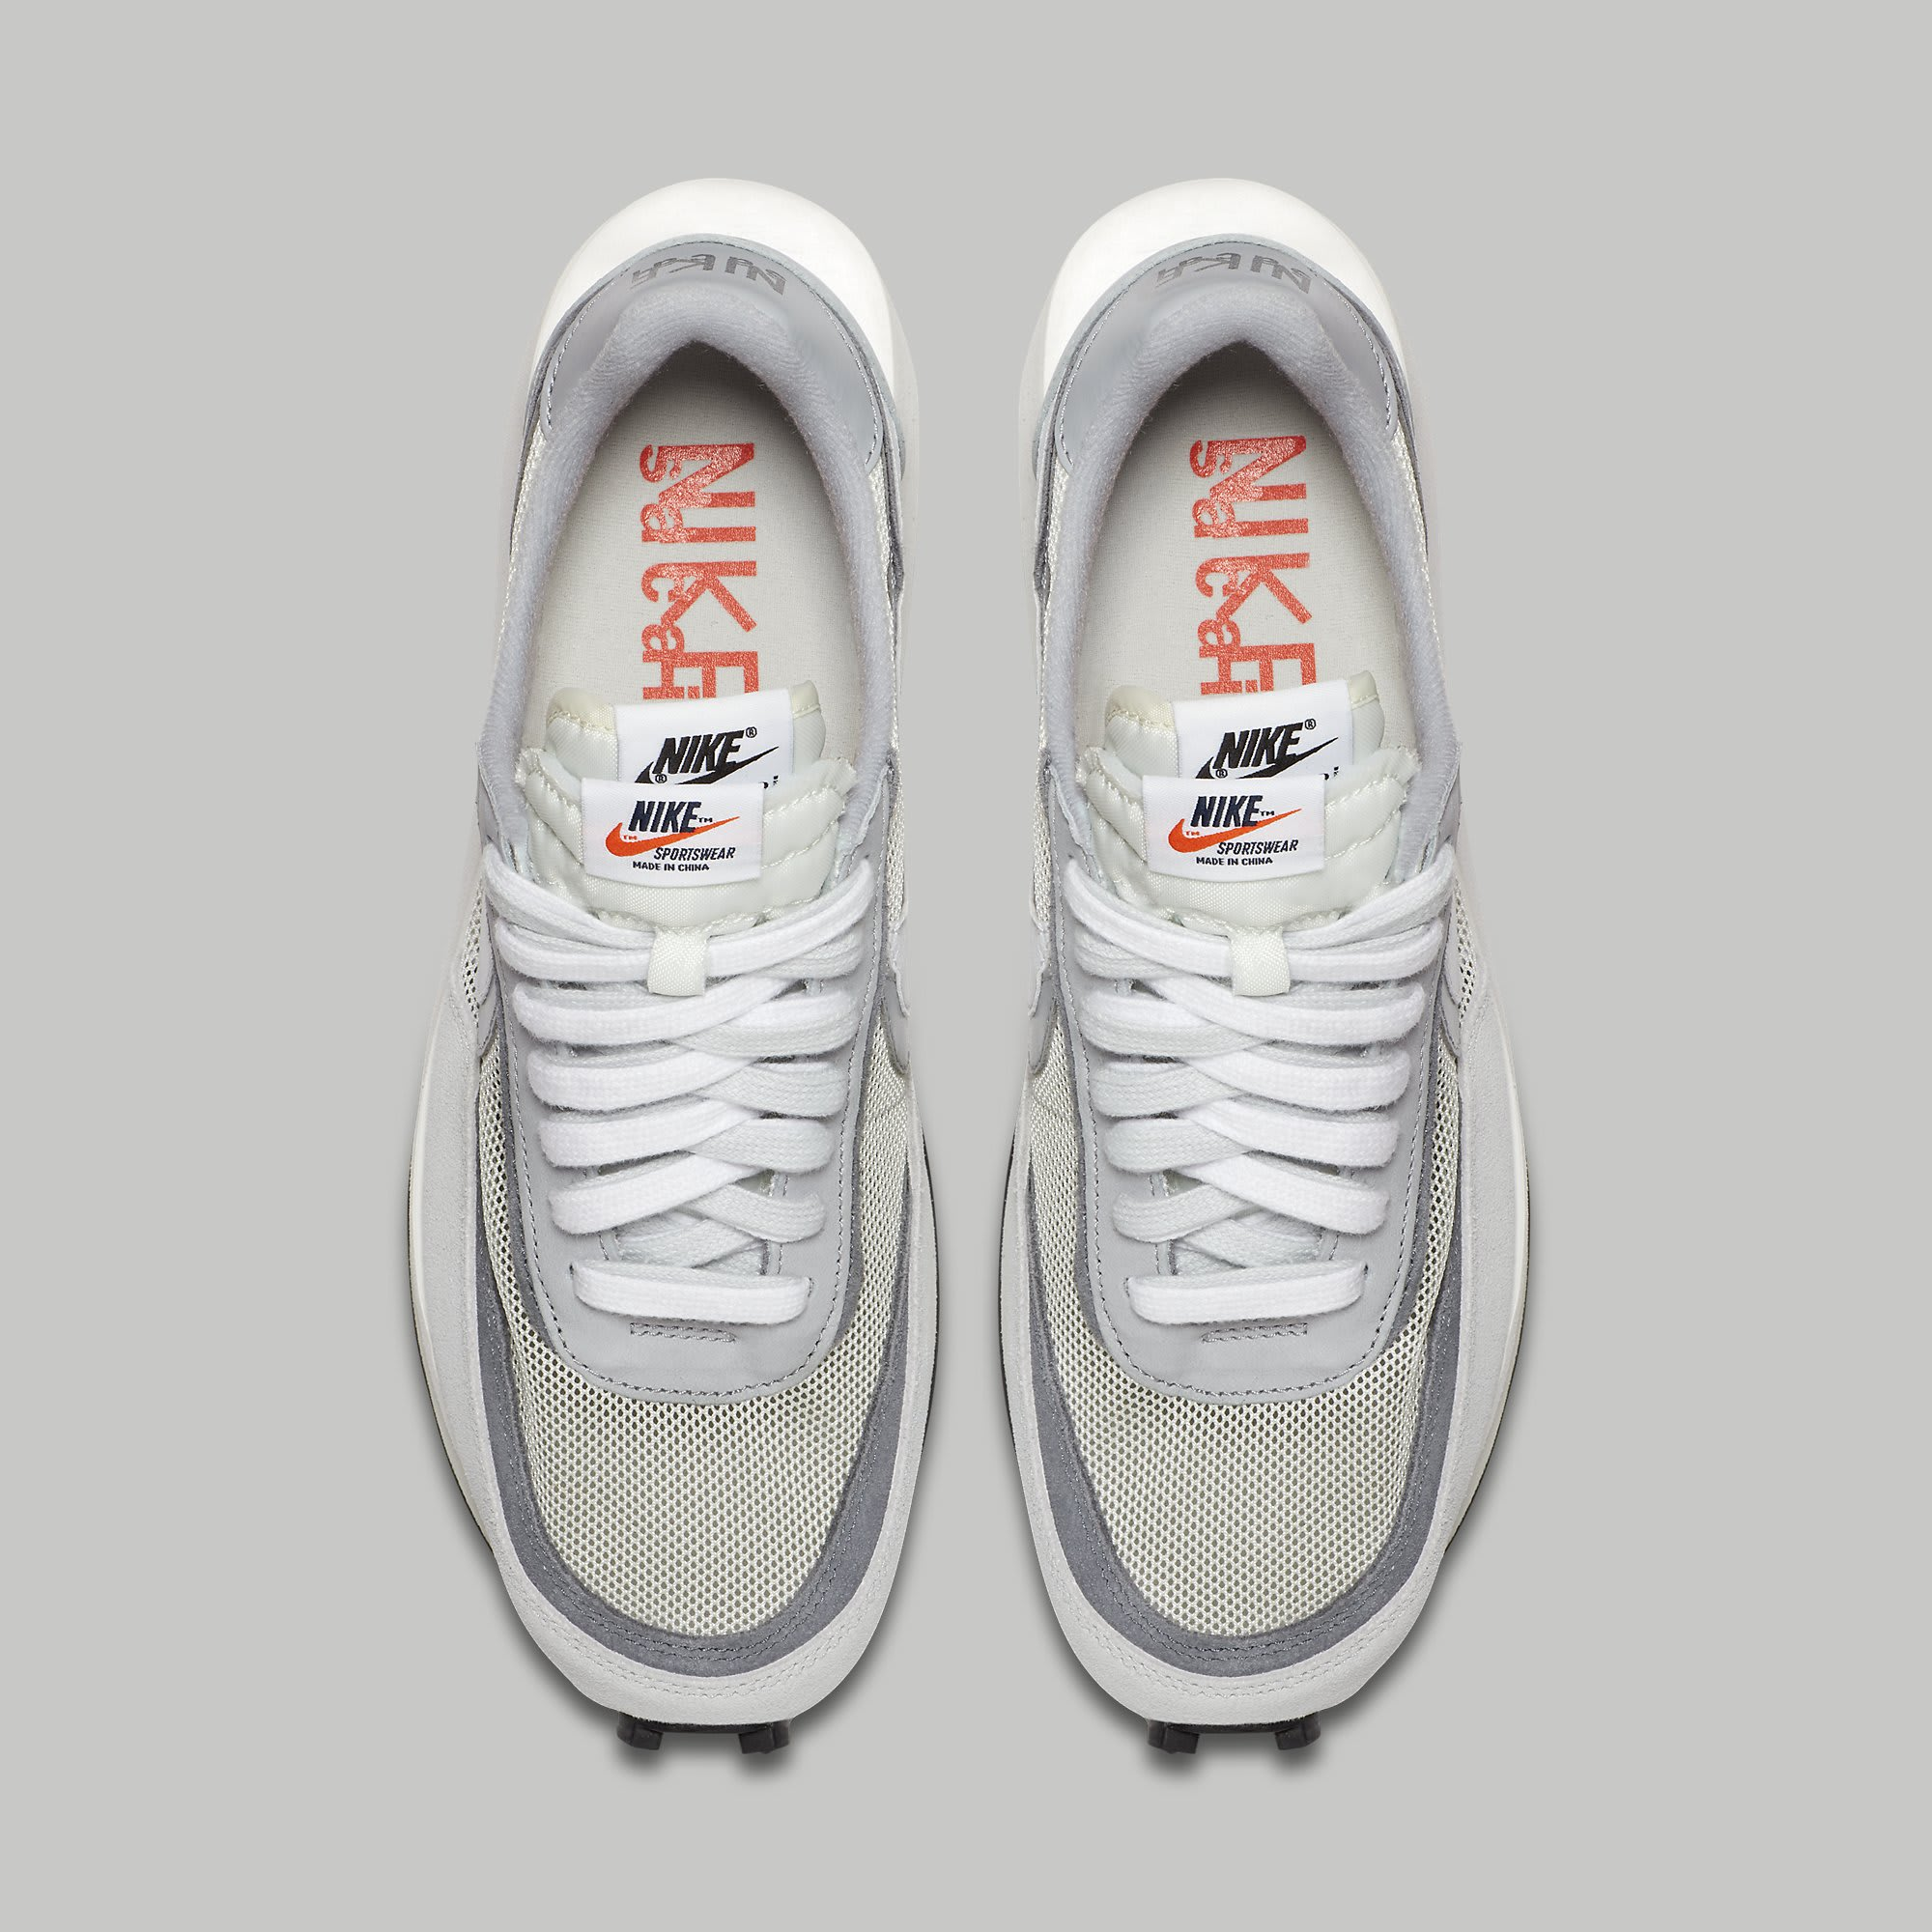 Sacai Nike LDWaffle Summit White Wolf Grey Release Date BV0073-100 Top